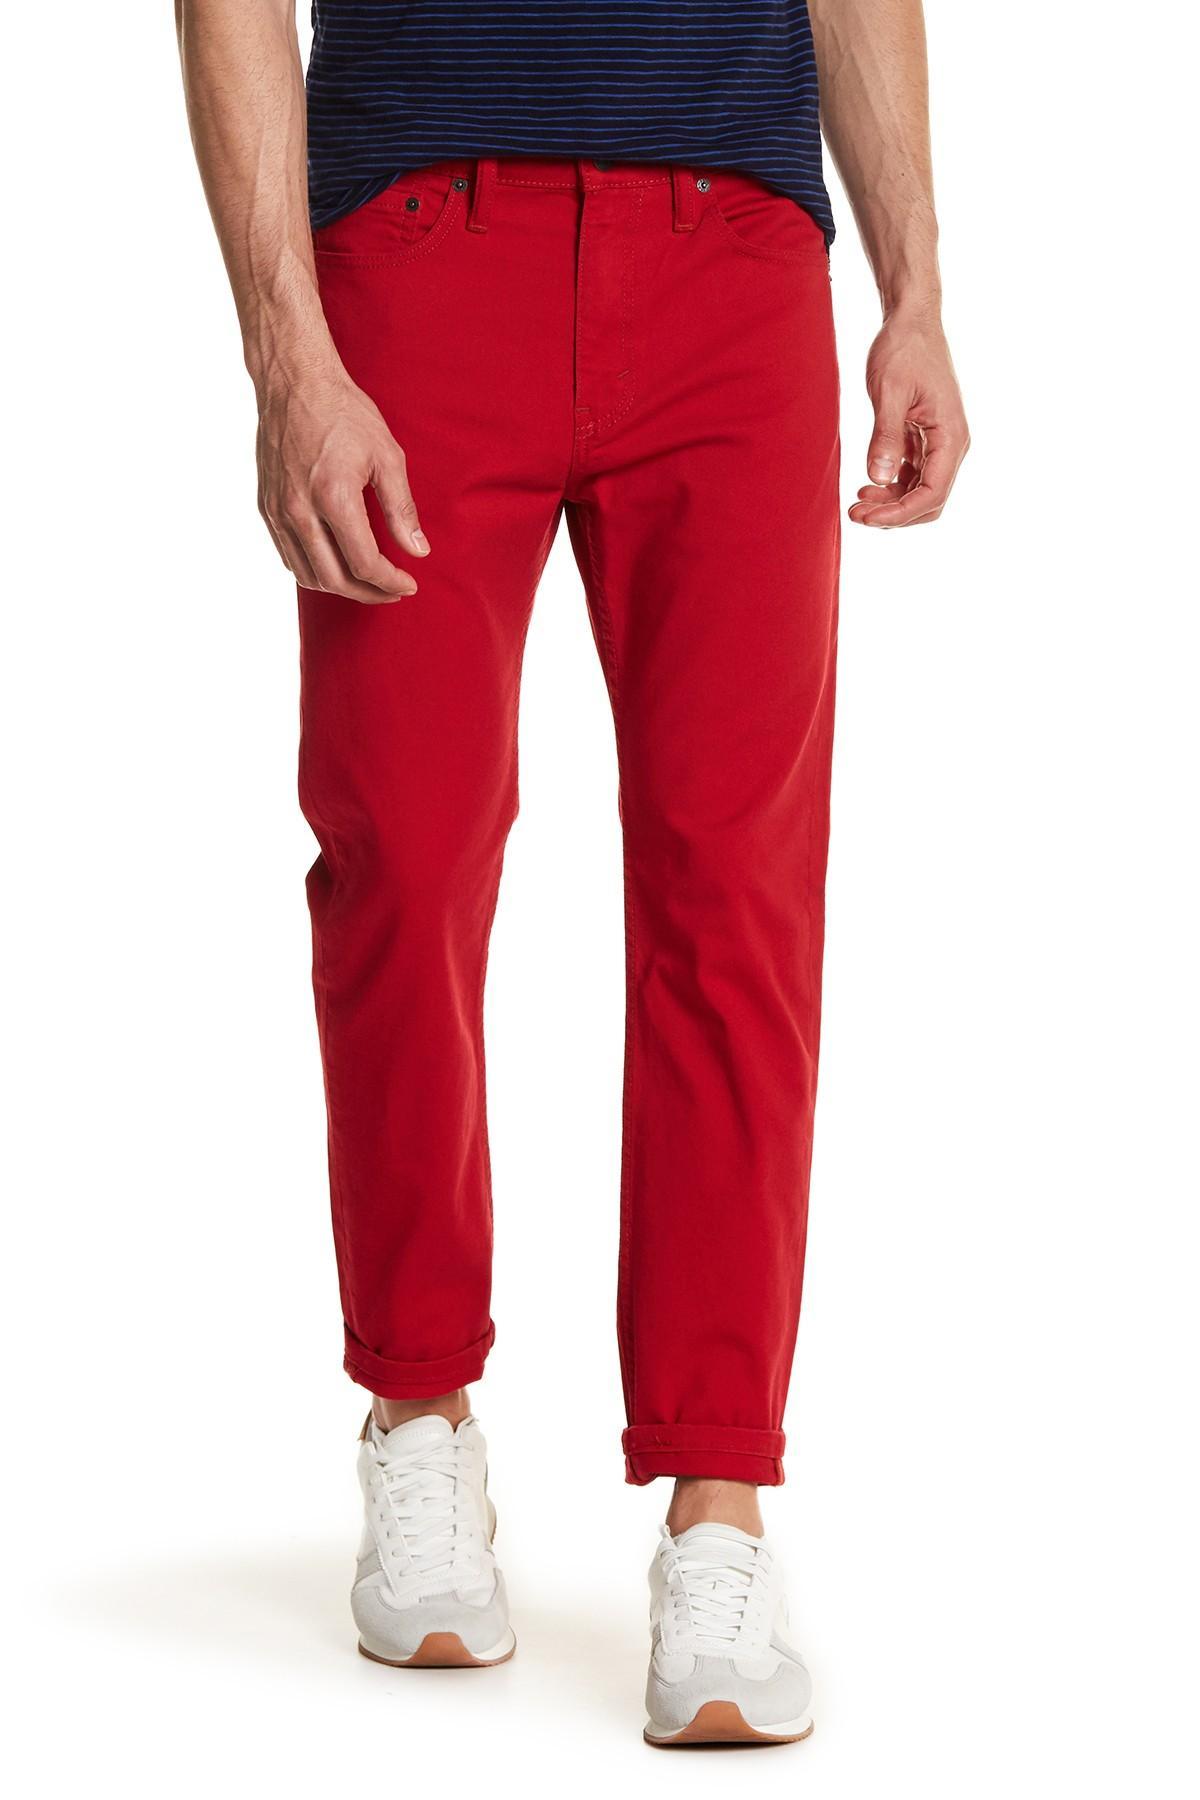 levi 39 s 510 skinny fit scooter jean 29 36 inseam in red for men lyst. Black Bedroom Furniture Sets. Home Design Ideas